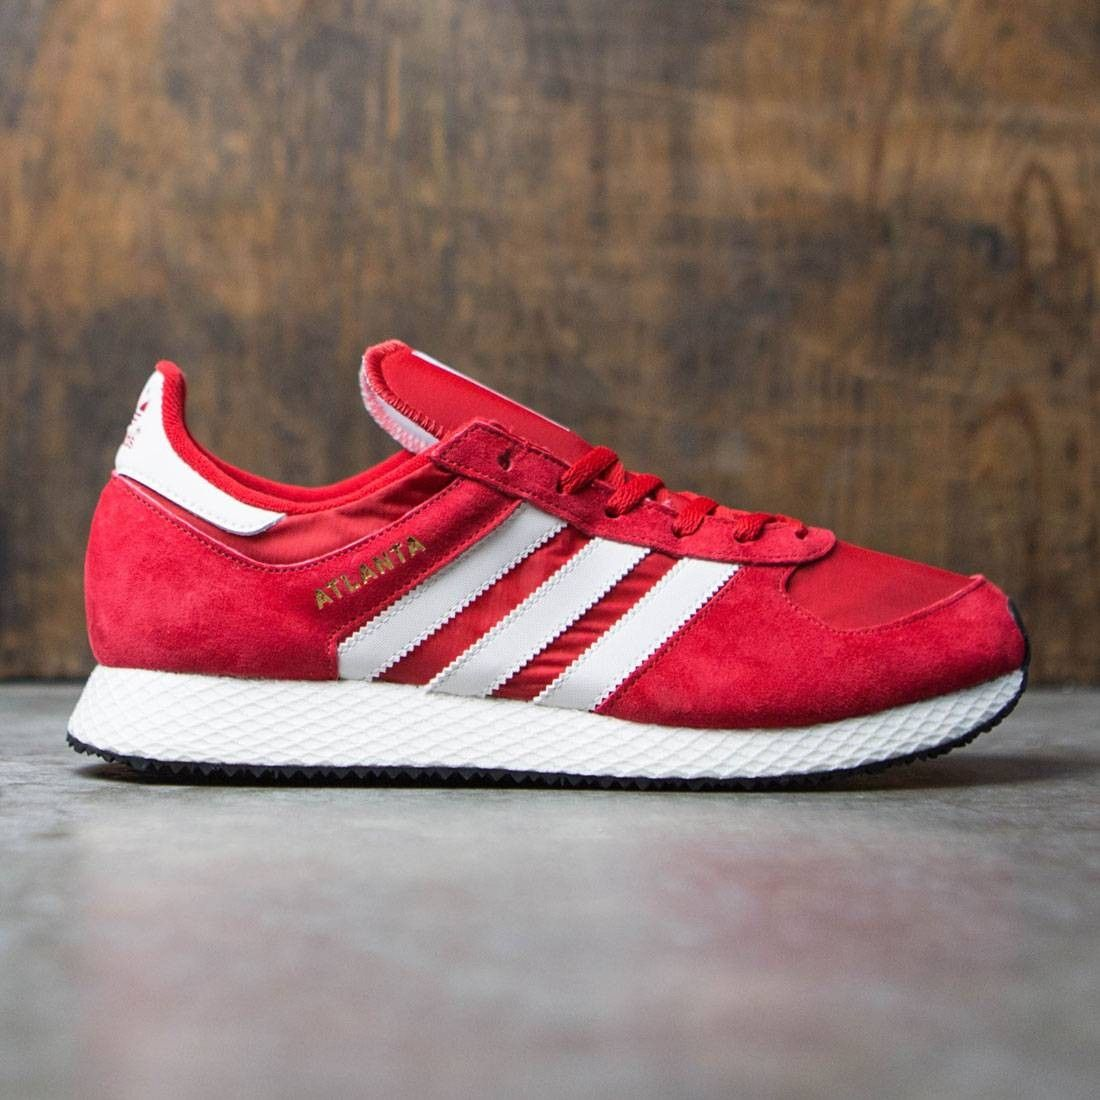 Adidas Men Atlanta Spzl Red Scarlet Chalk White Gold